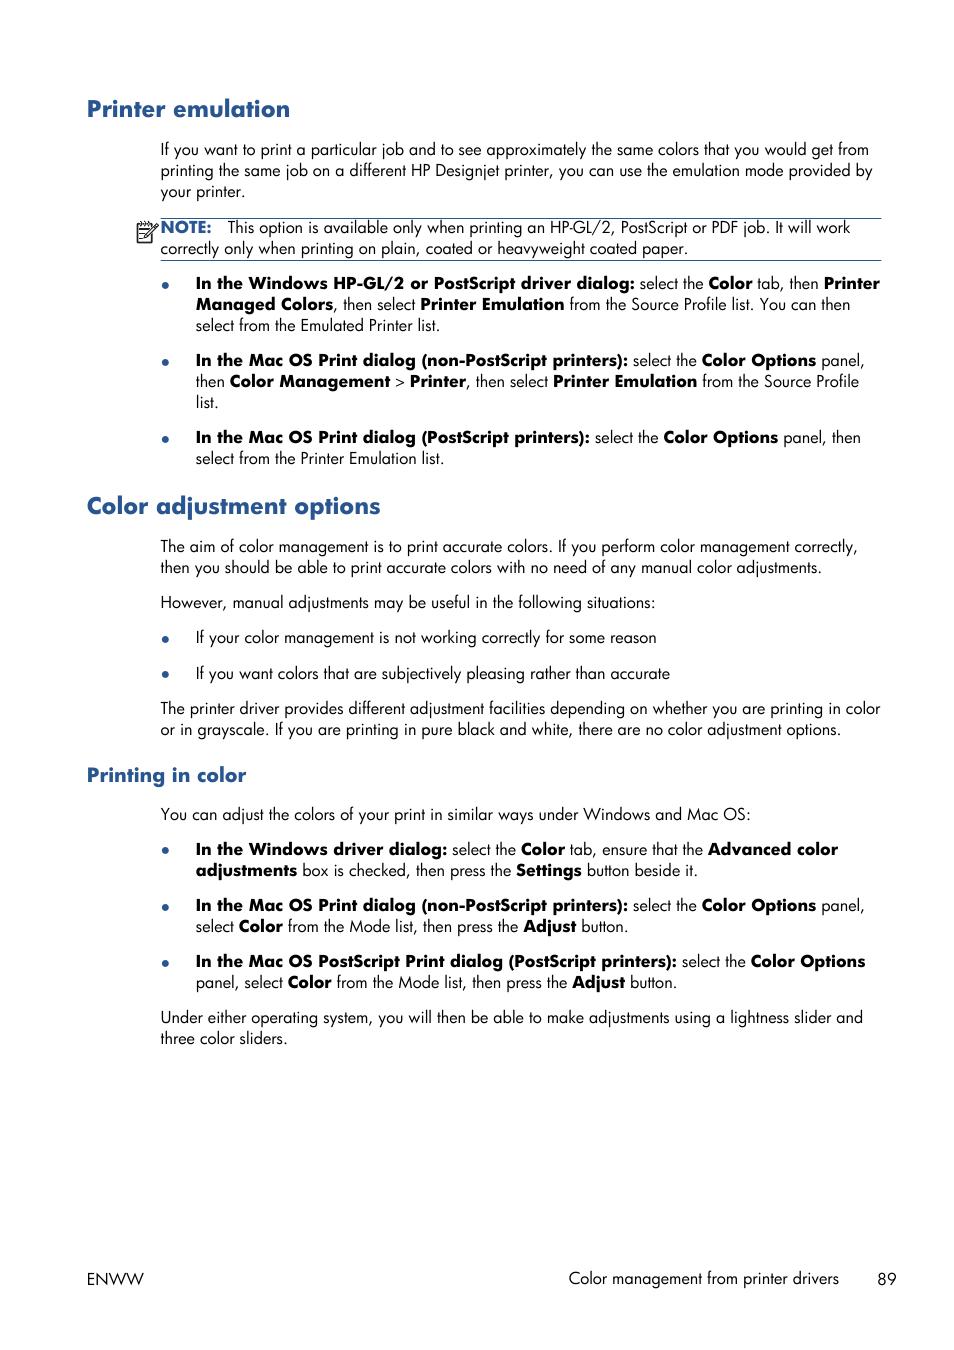 Printer emulation, Color adjustment options, Printing in